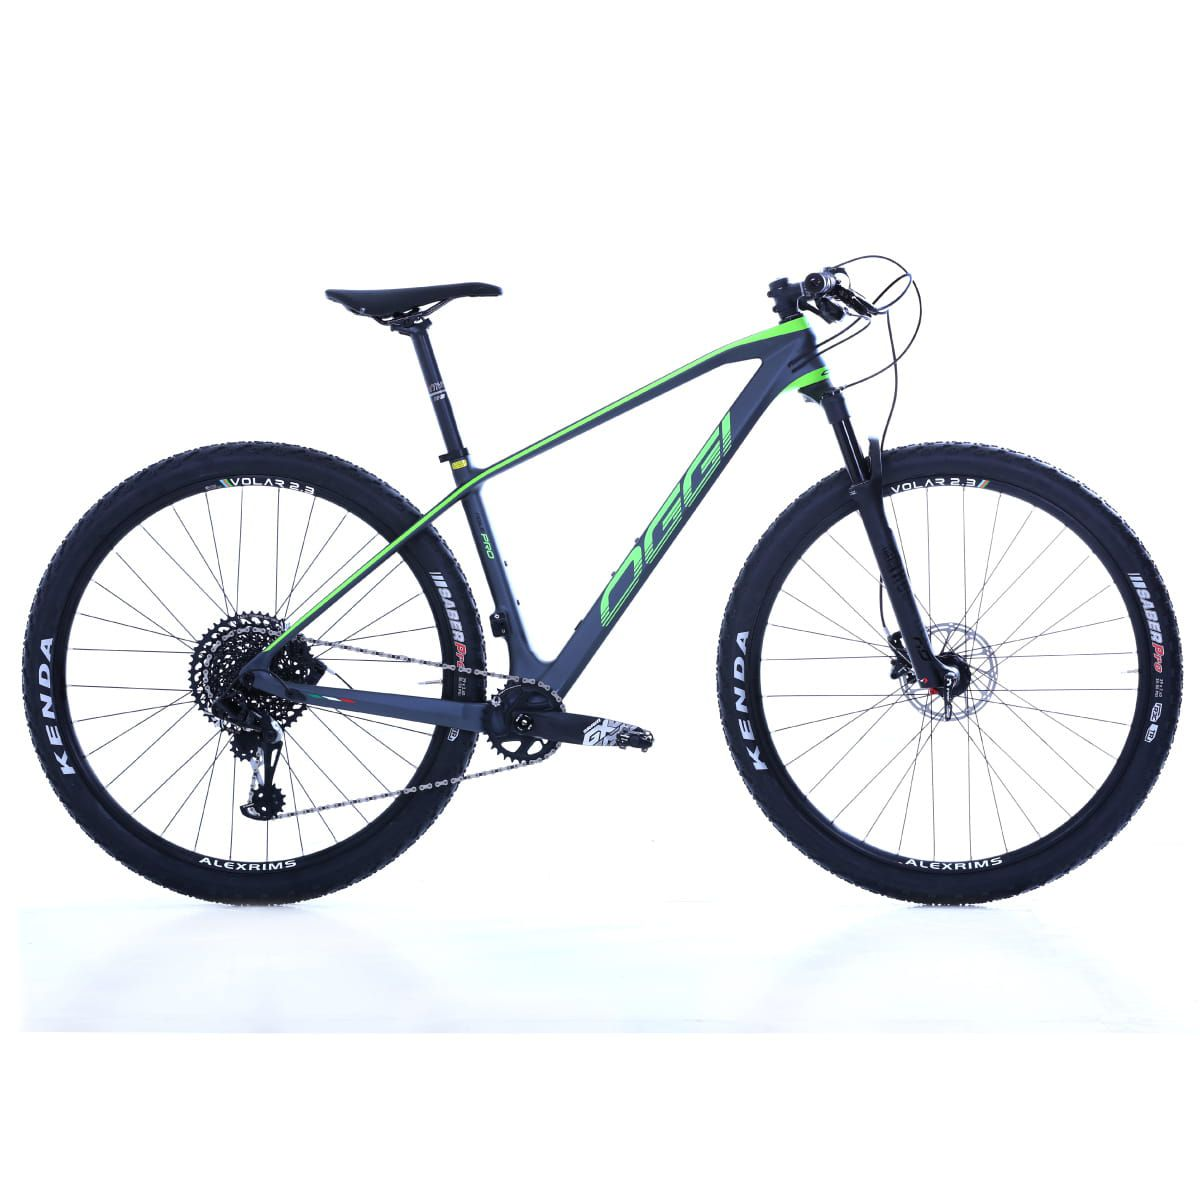 Bike Oggi Agile Pro GX 2020 Carbon Sram 12v